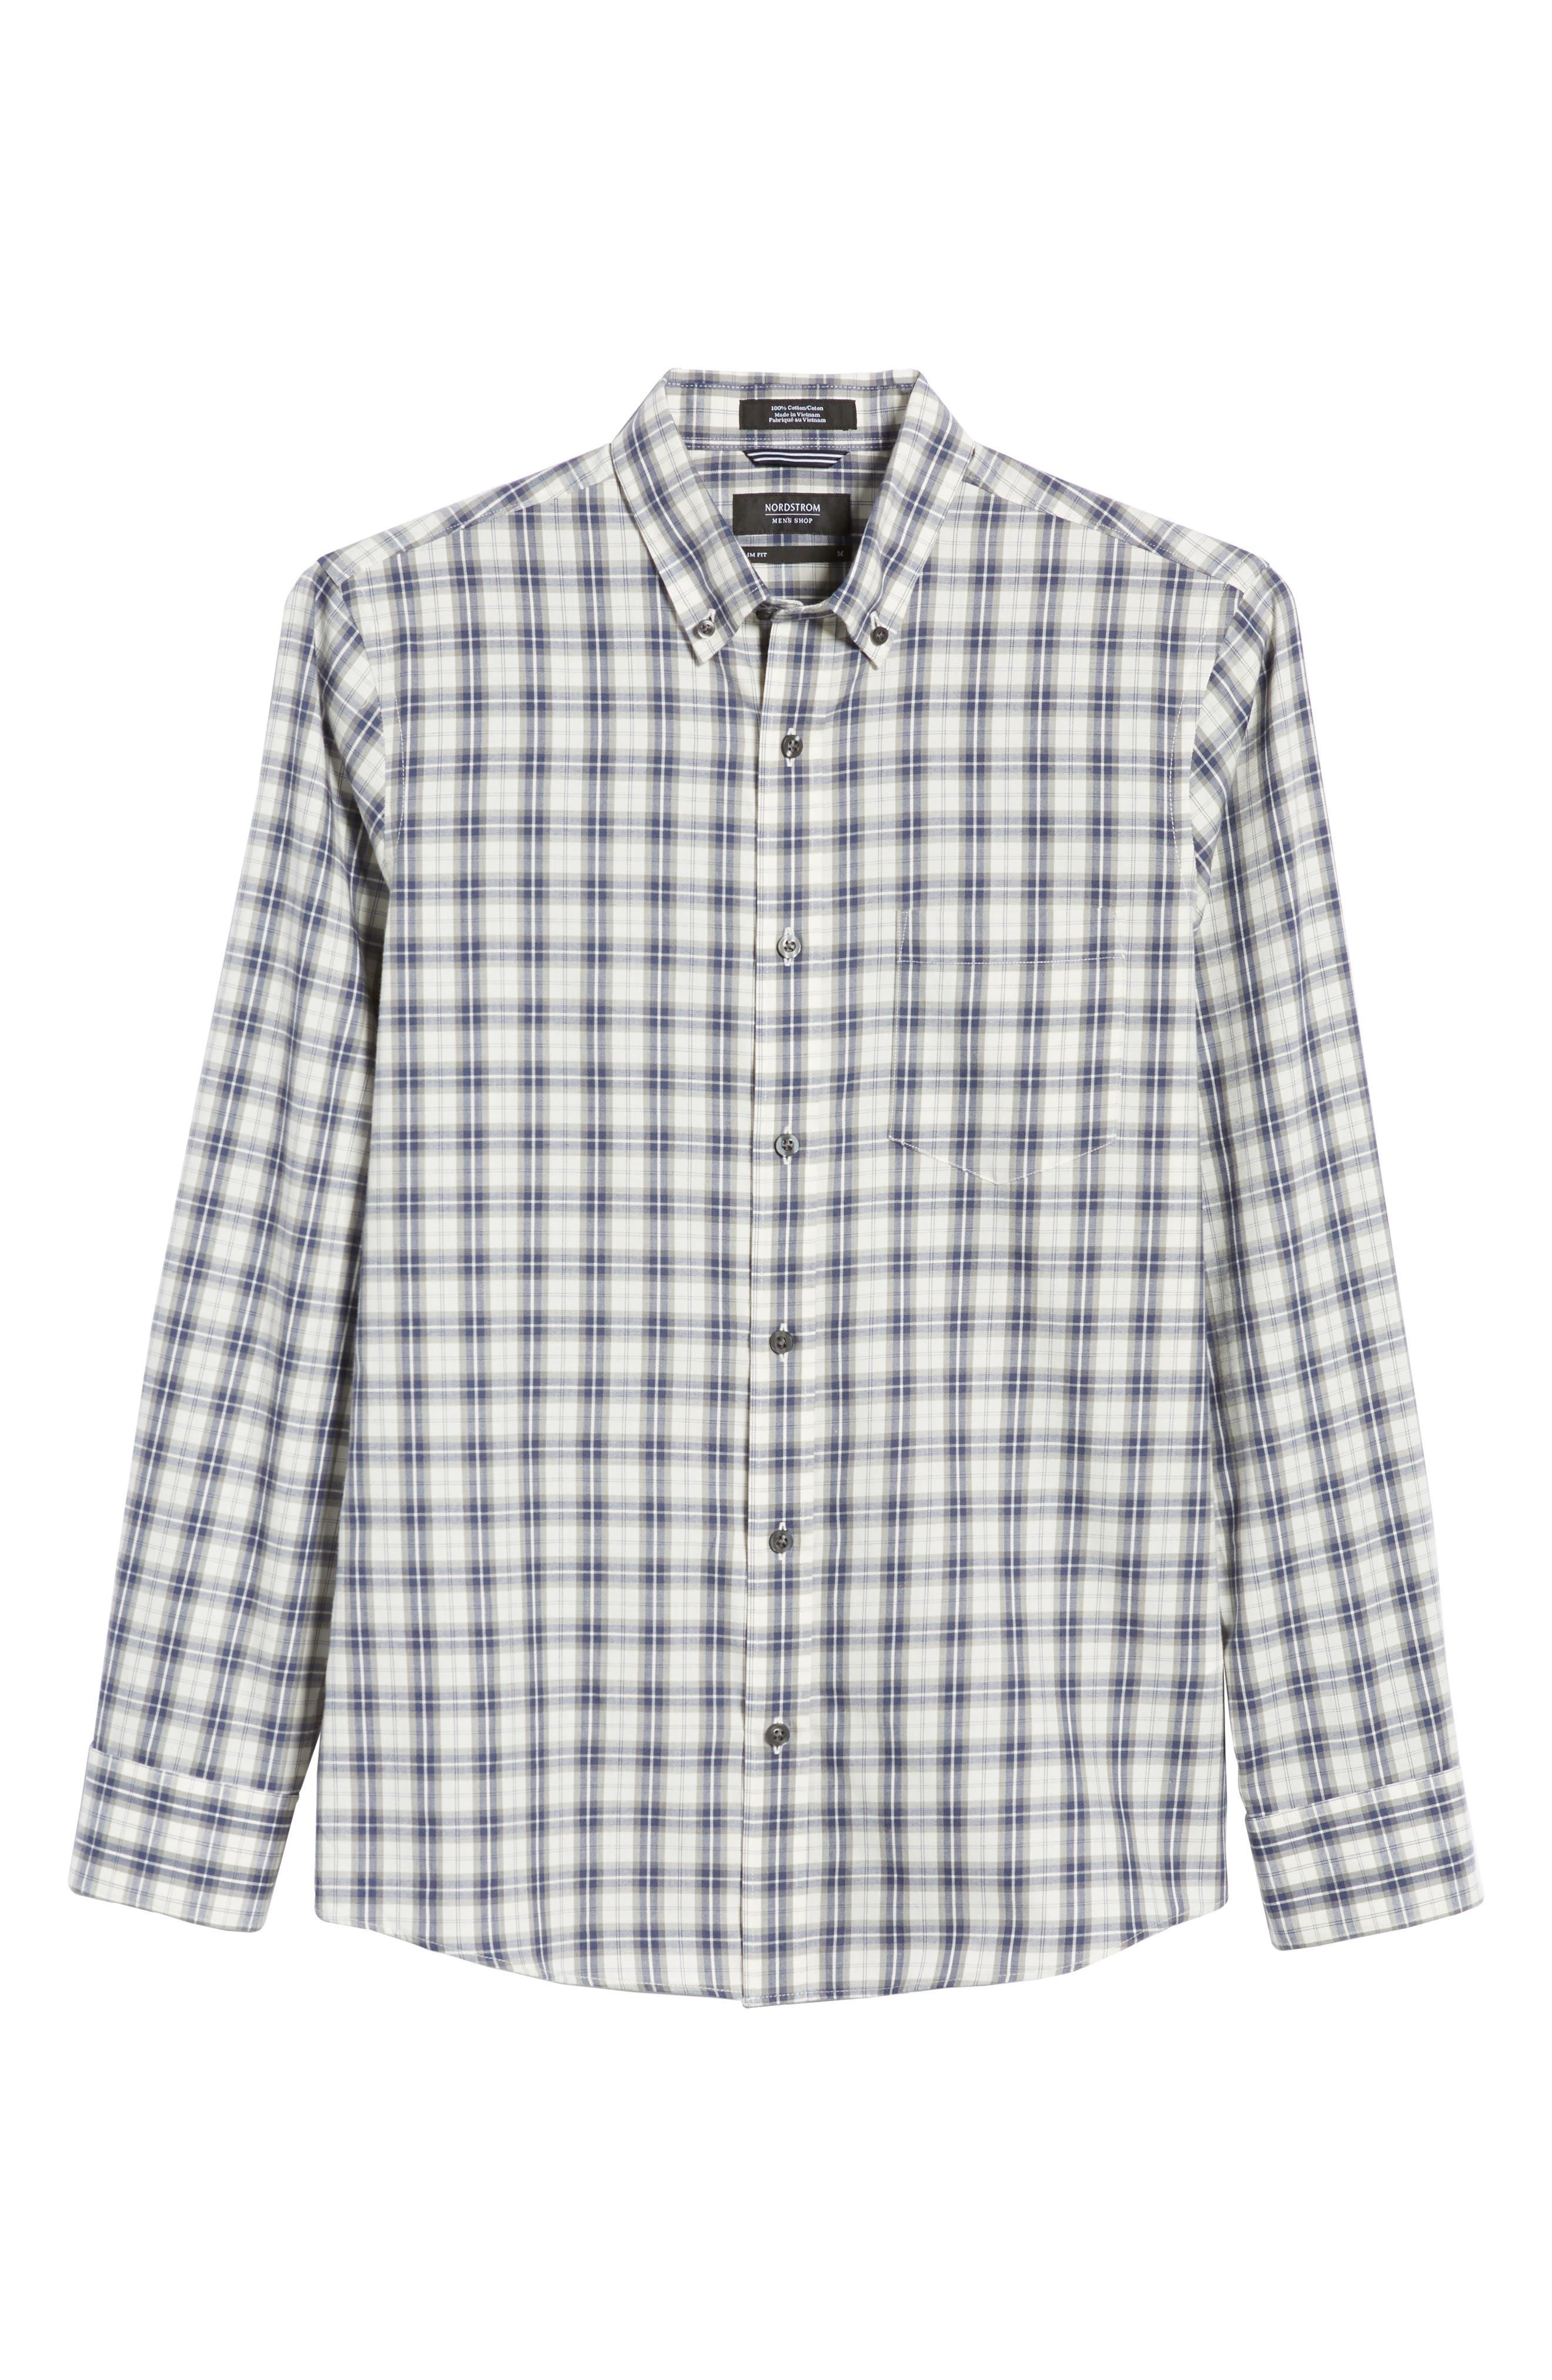 Slim Fit Plaid Sport Shirt,                             Alternate thumbnail 5, color,                             WHITE BLUE ENSIGN GREY PLAID